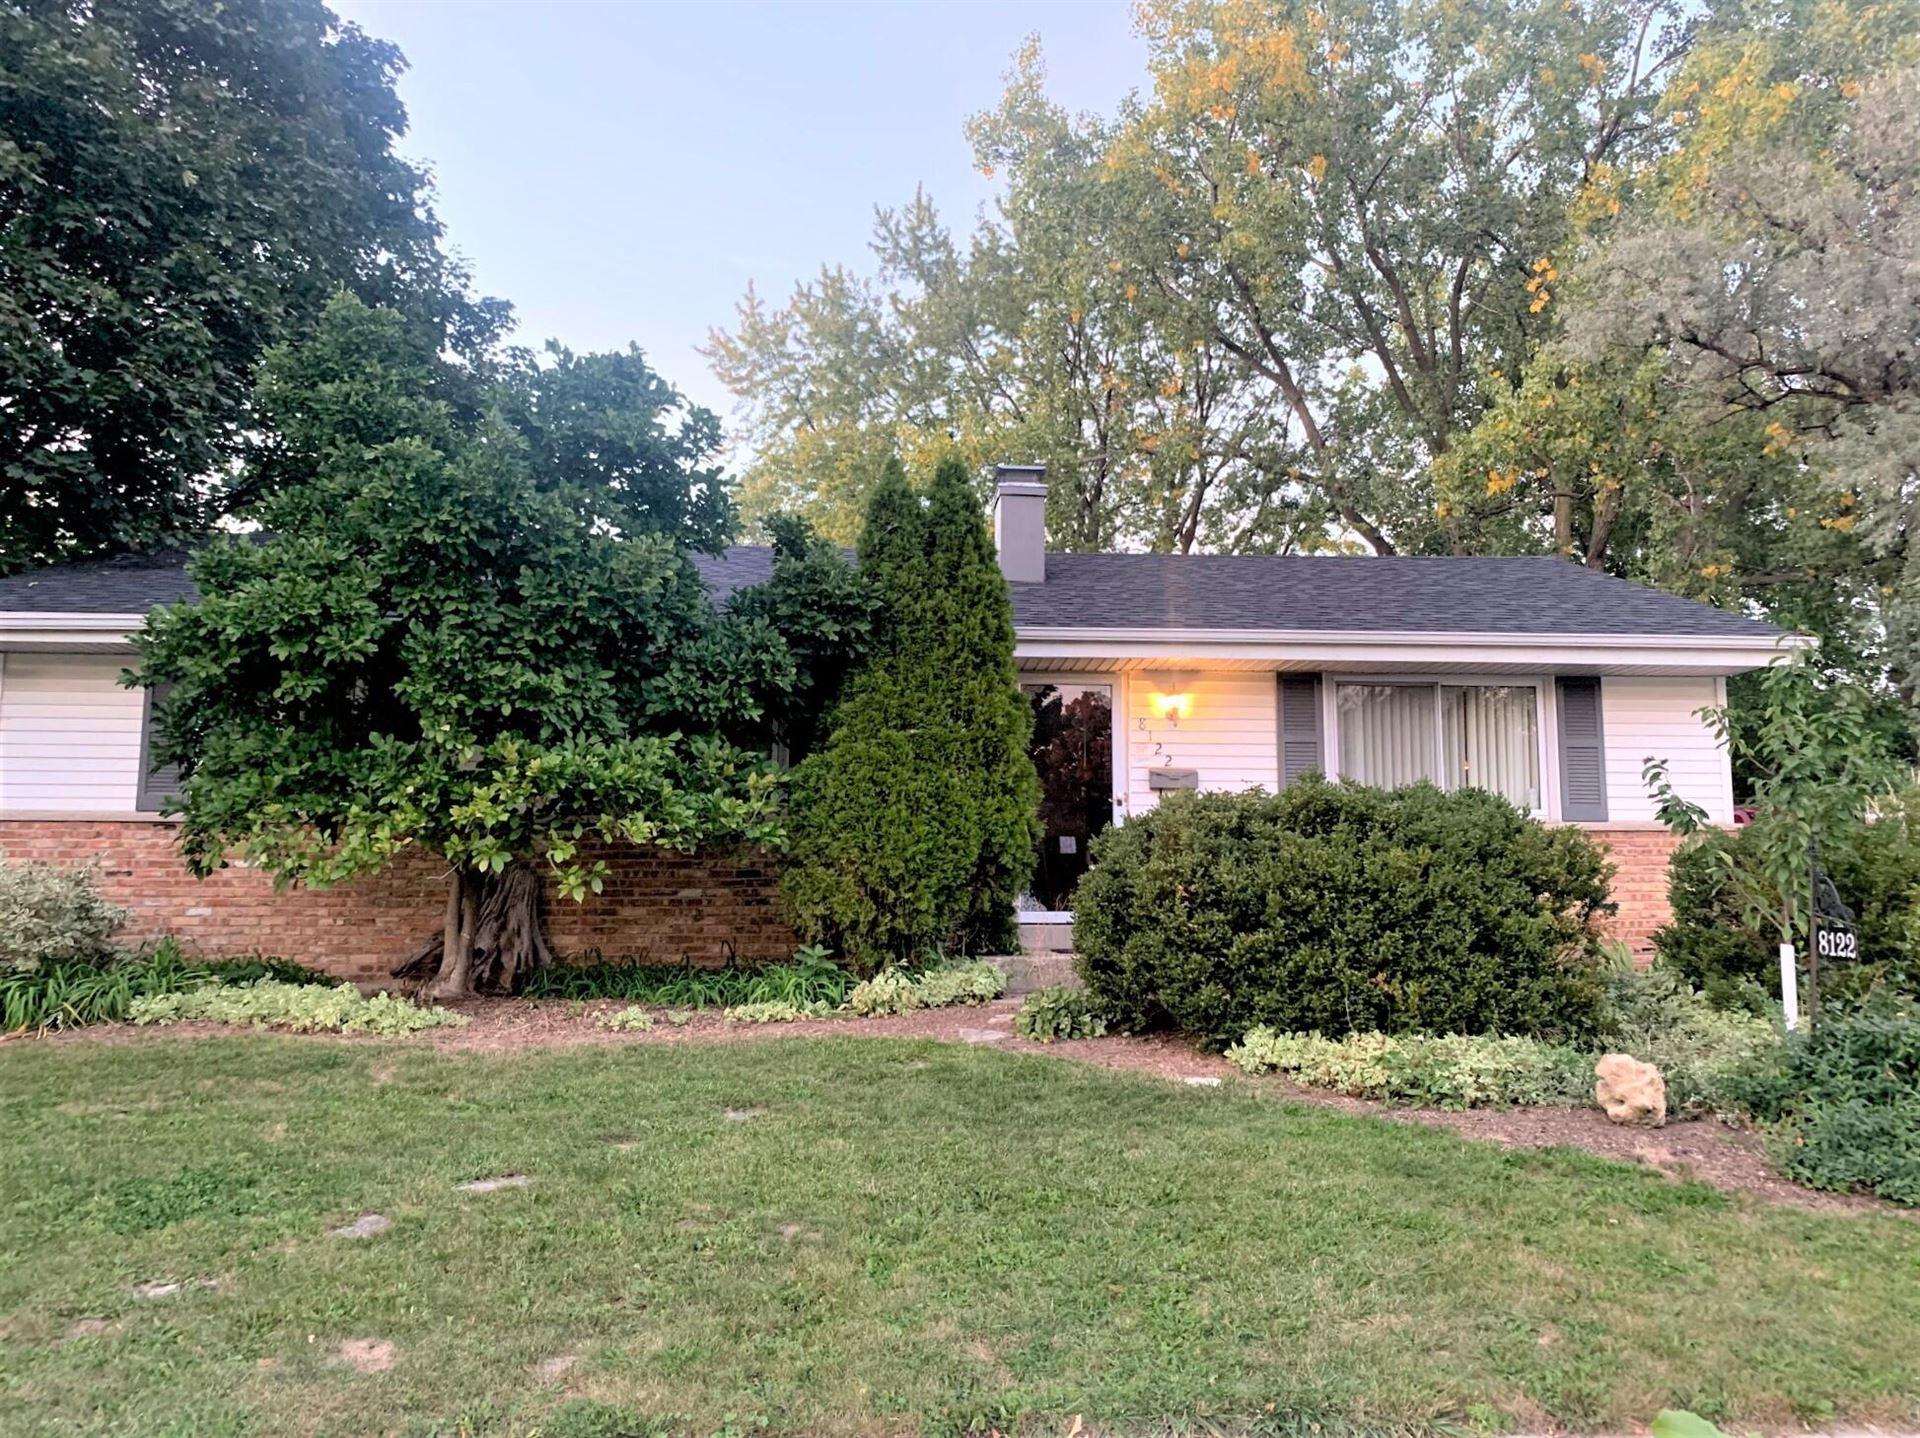 8122 W Green Tree Rd, Milwaukee, WI 53223 - #: 1766112